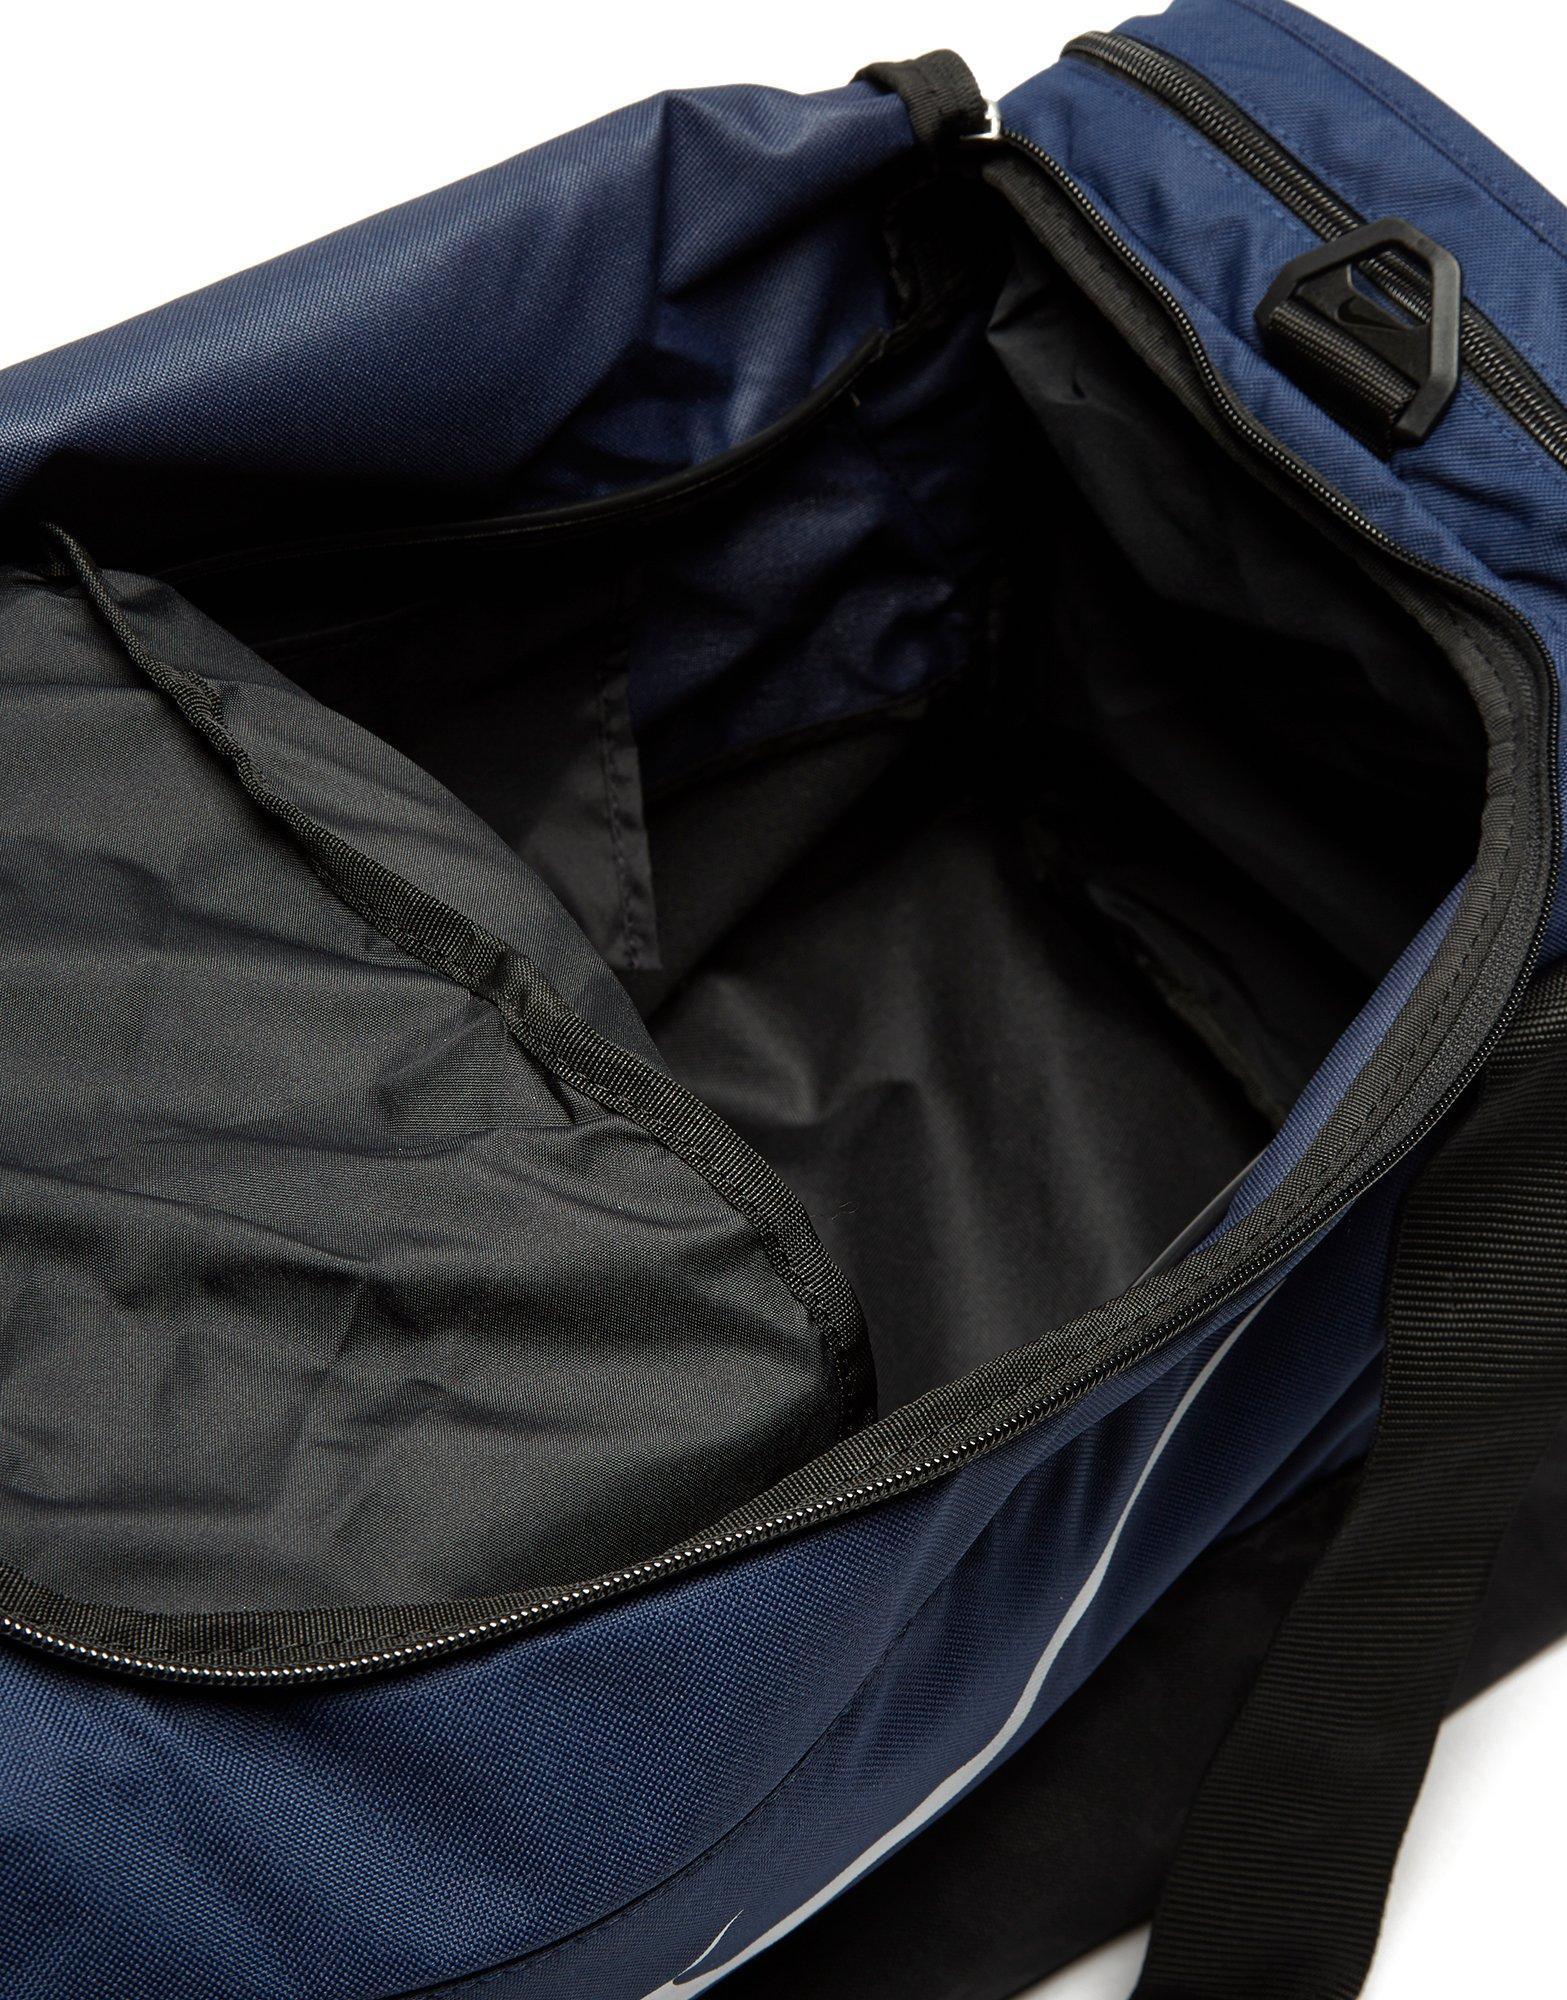 52ee79ac84b3 Nike Brasilia 6 Medium Duffel Bag in Blue for Men - Lyst